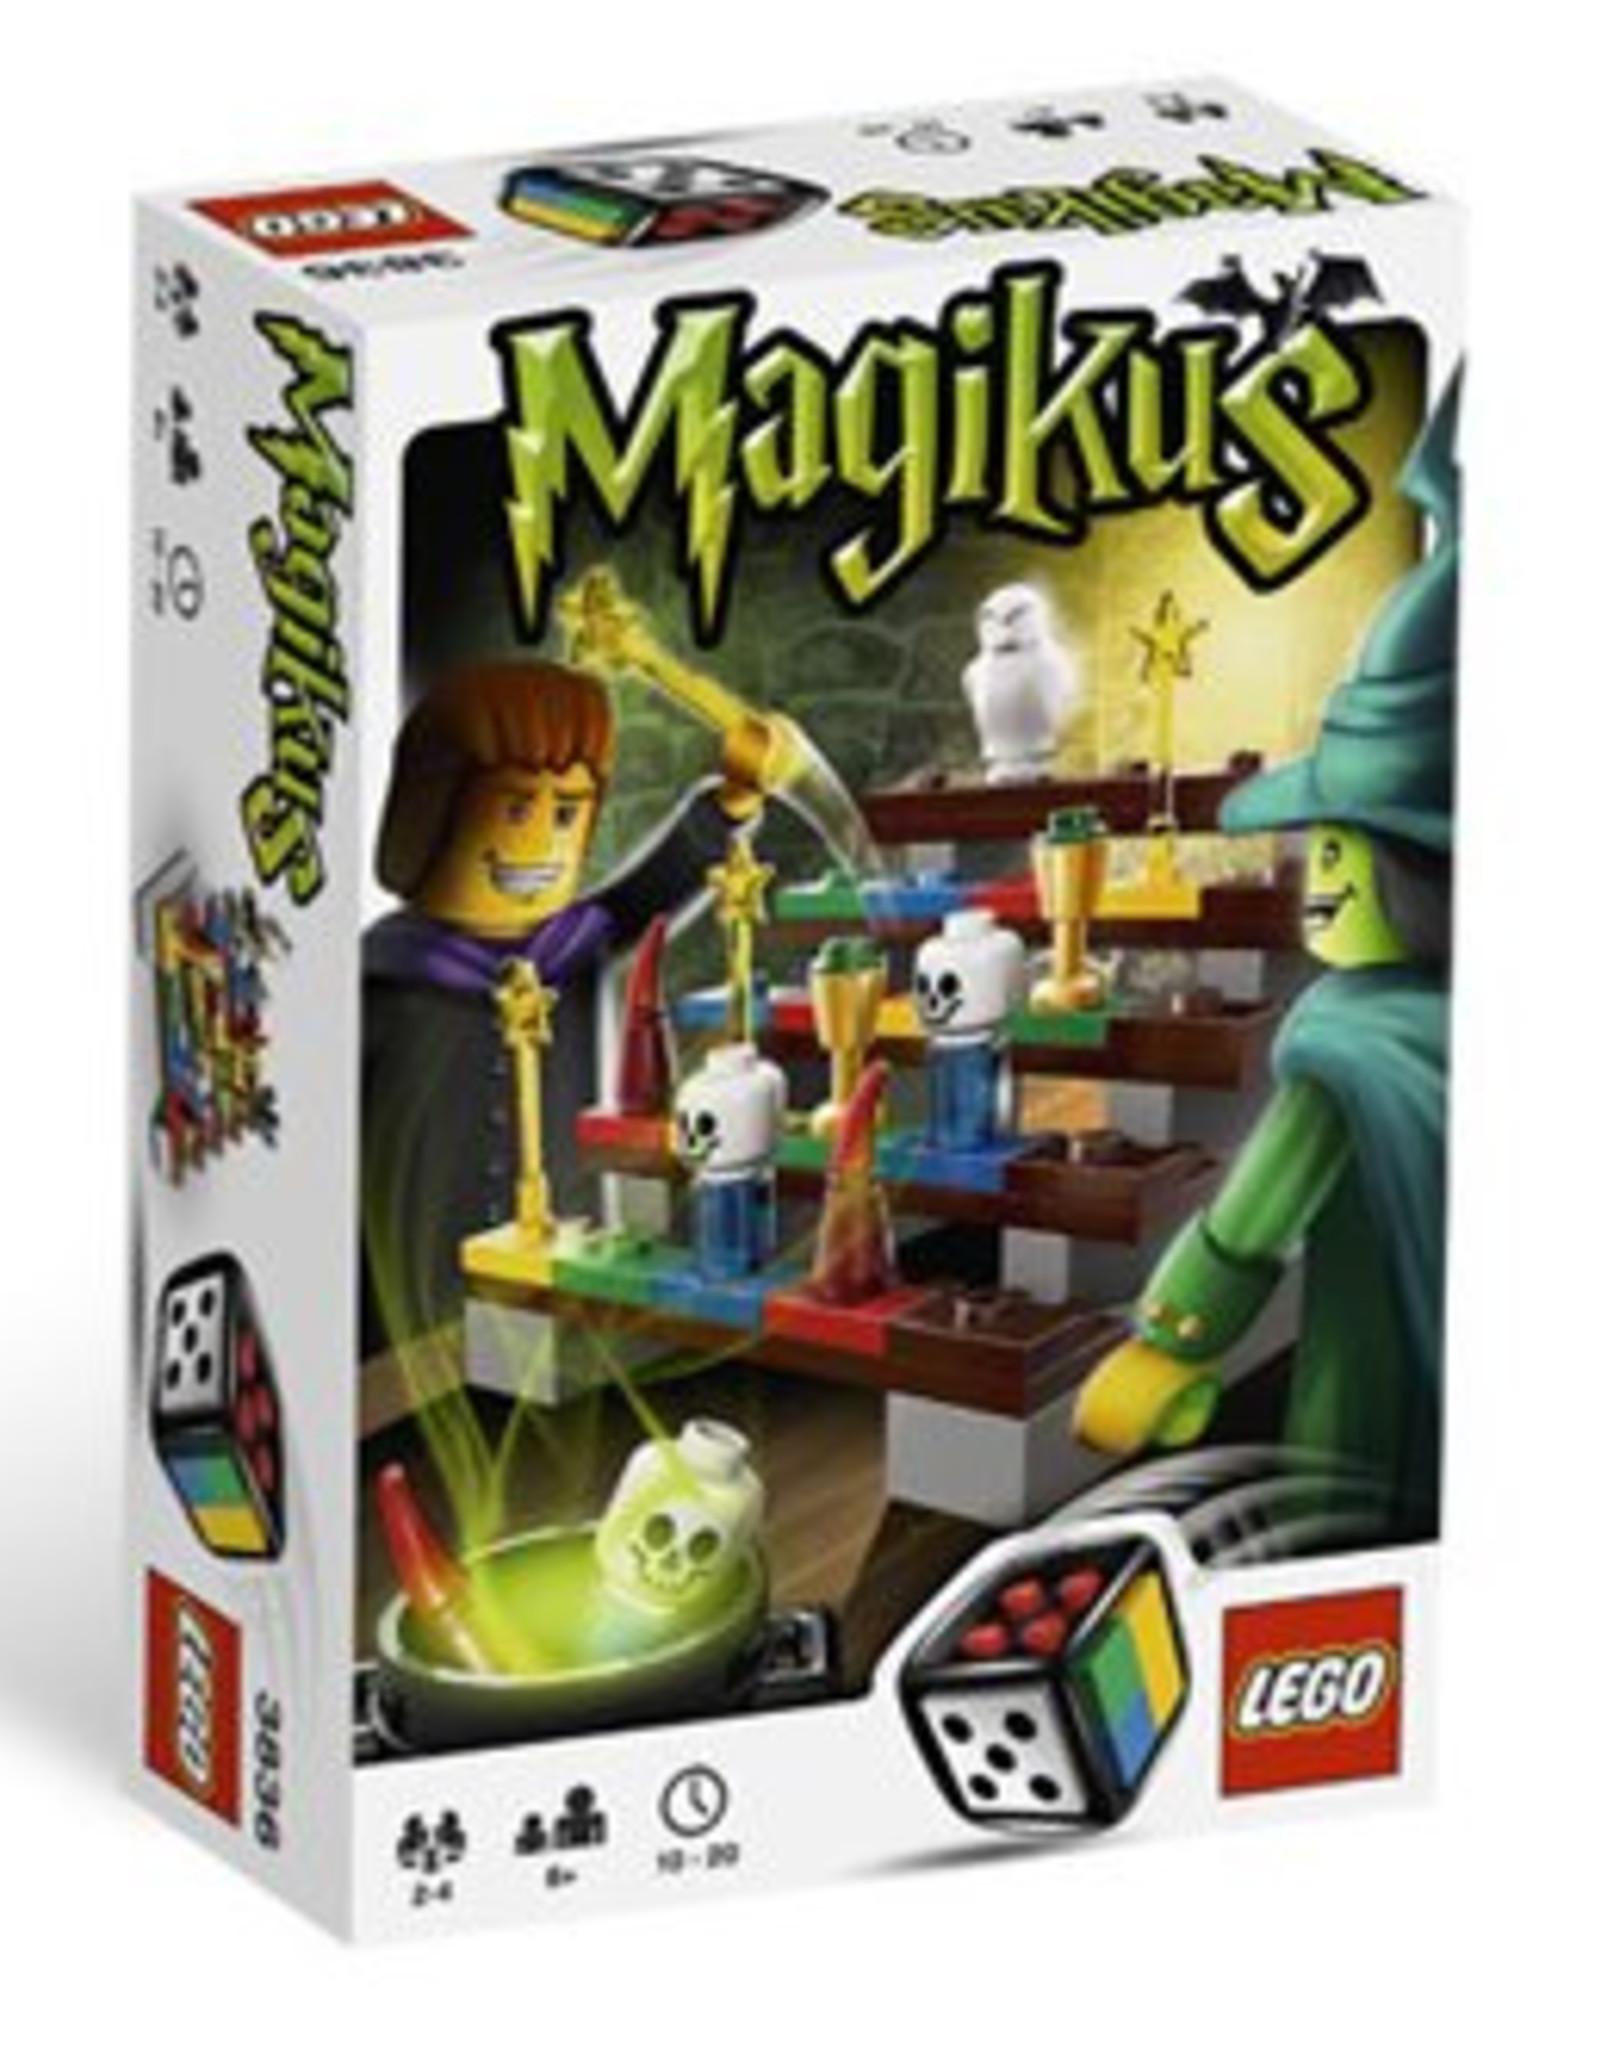 LEGO LEGO 3836 Magikus SPEL